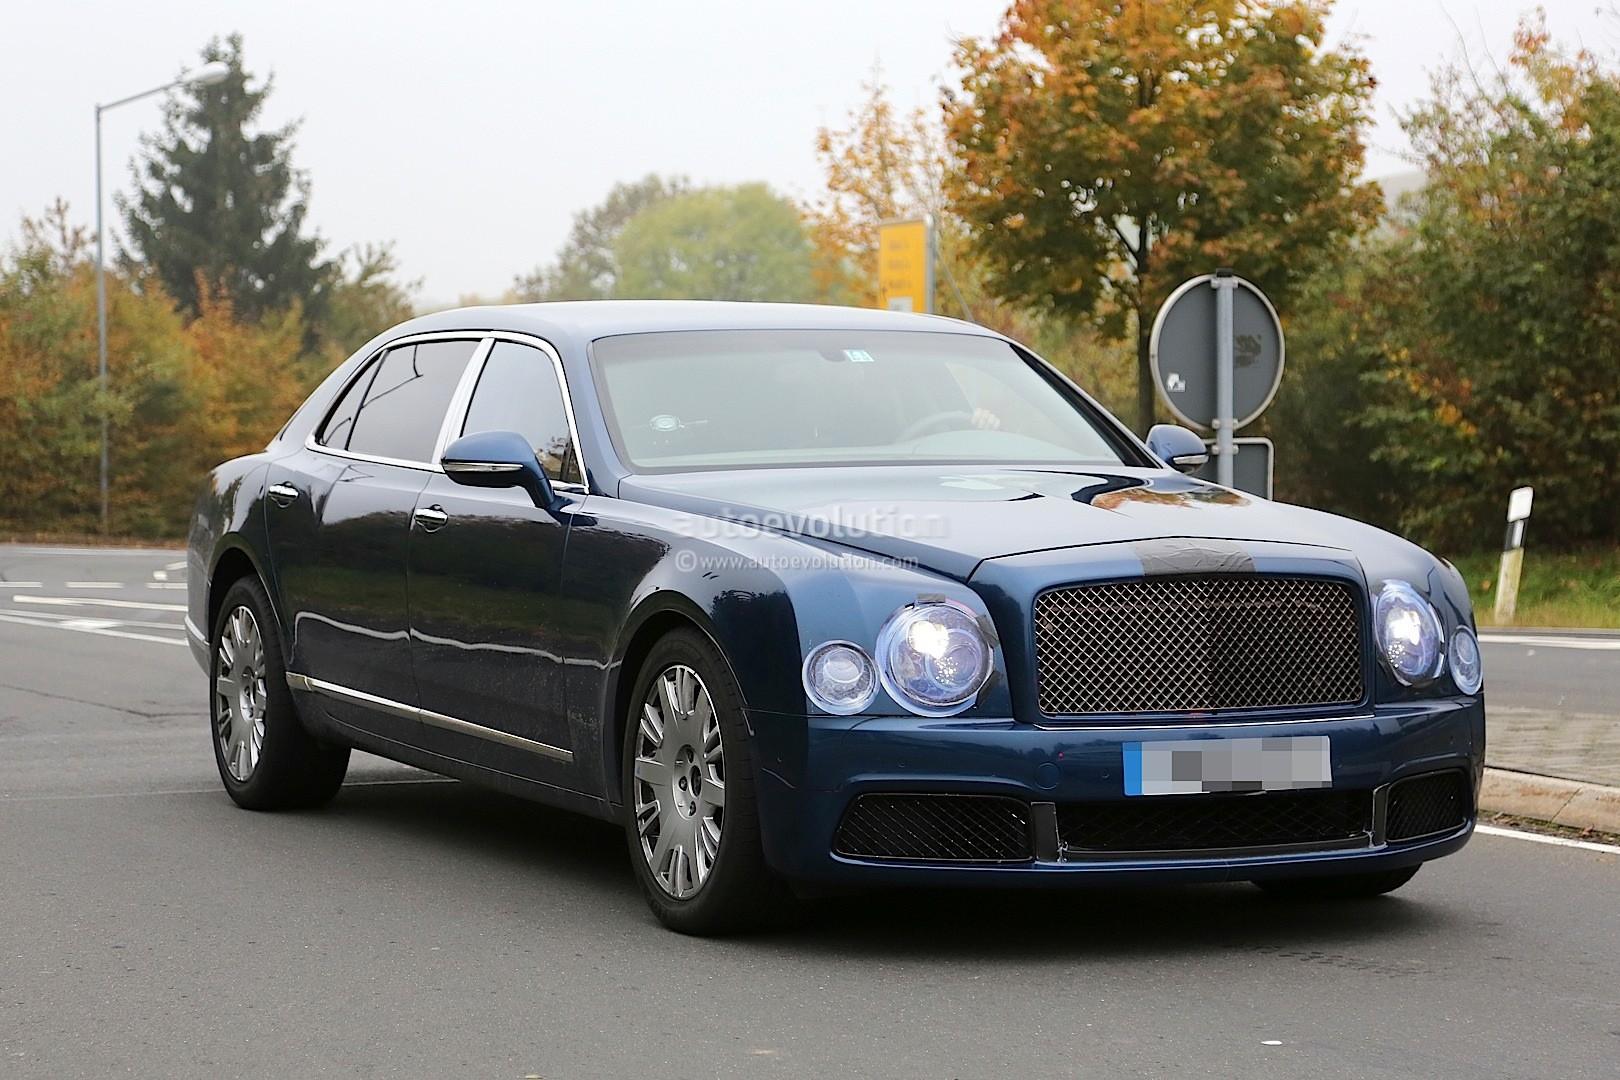 2014 Maserati Quattroporte >> 2017 Bentley Mulsanne Spyshots Reveal Long Wheelbase Model ...